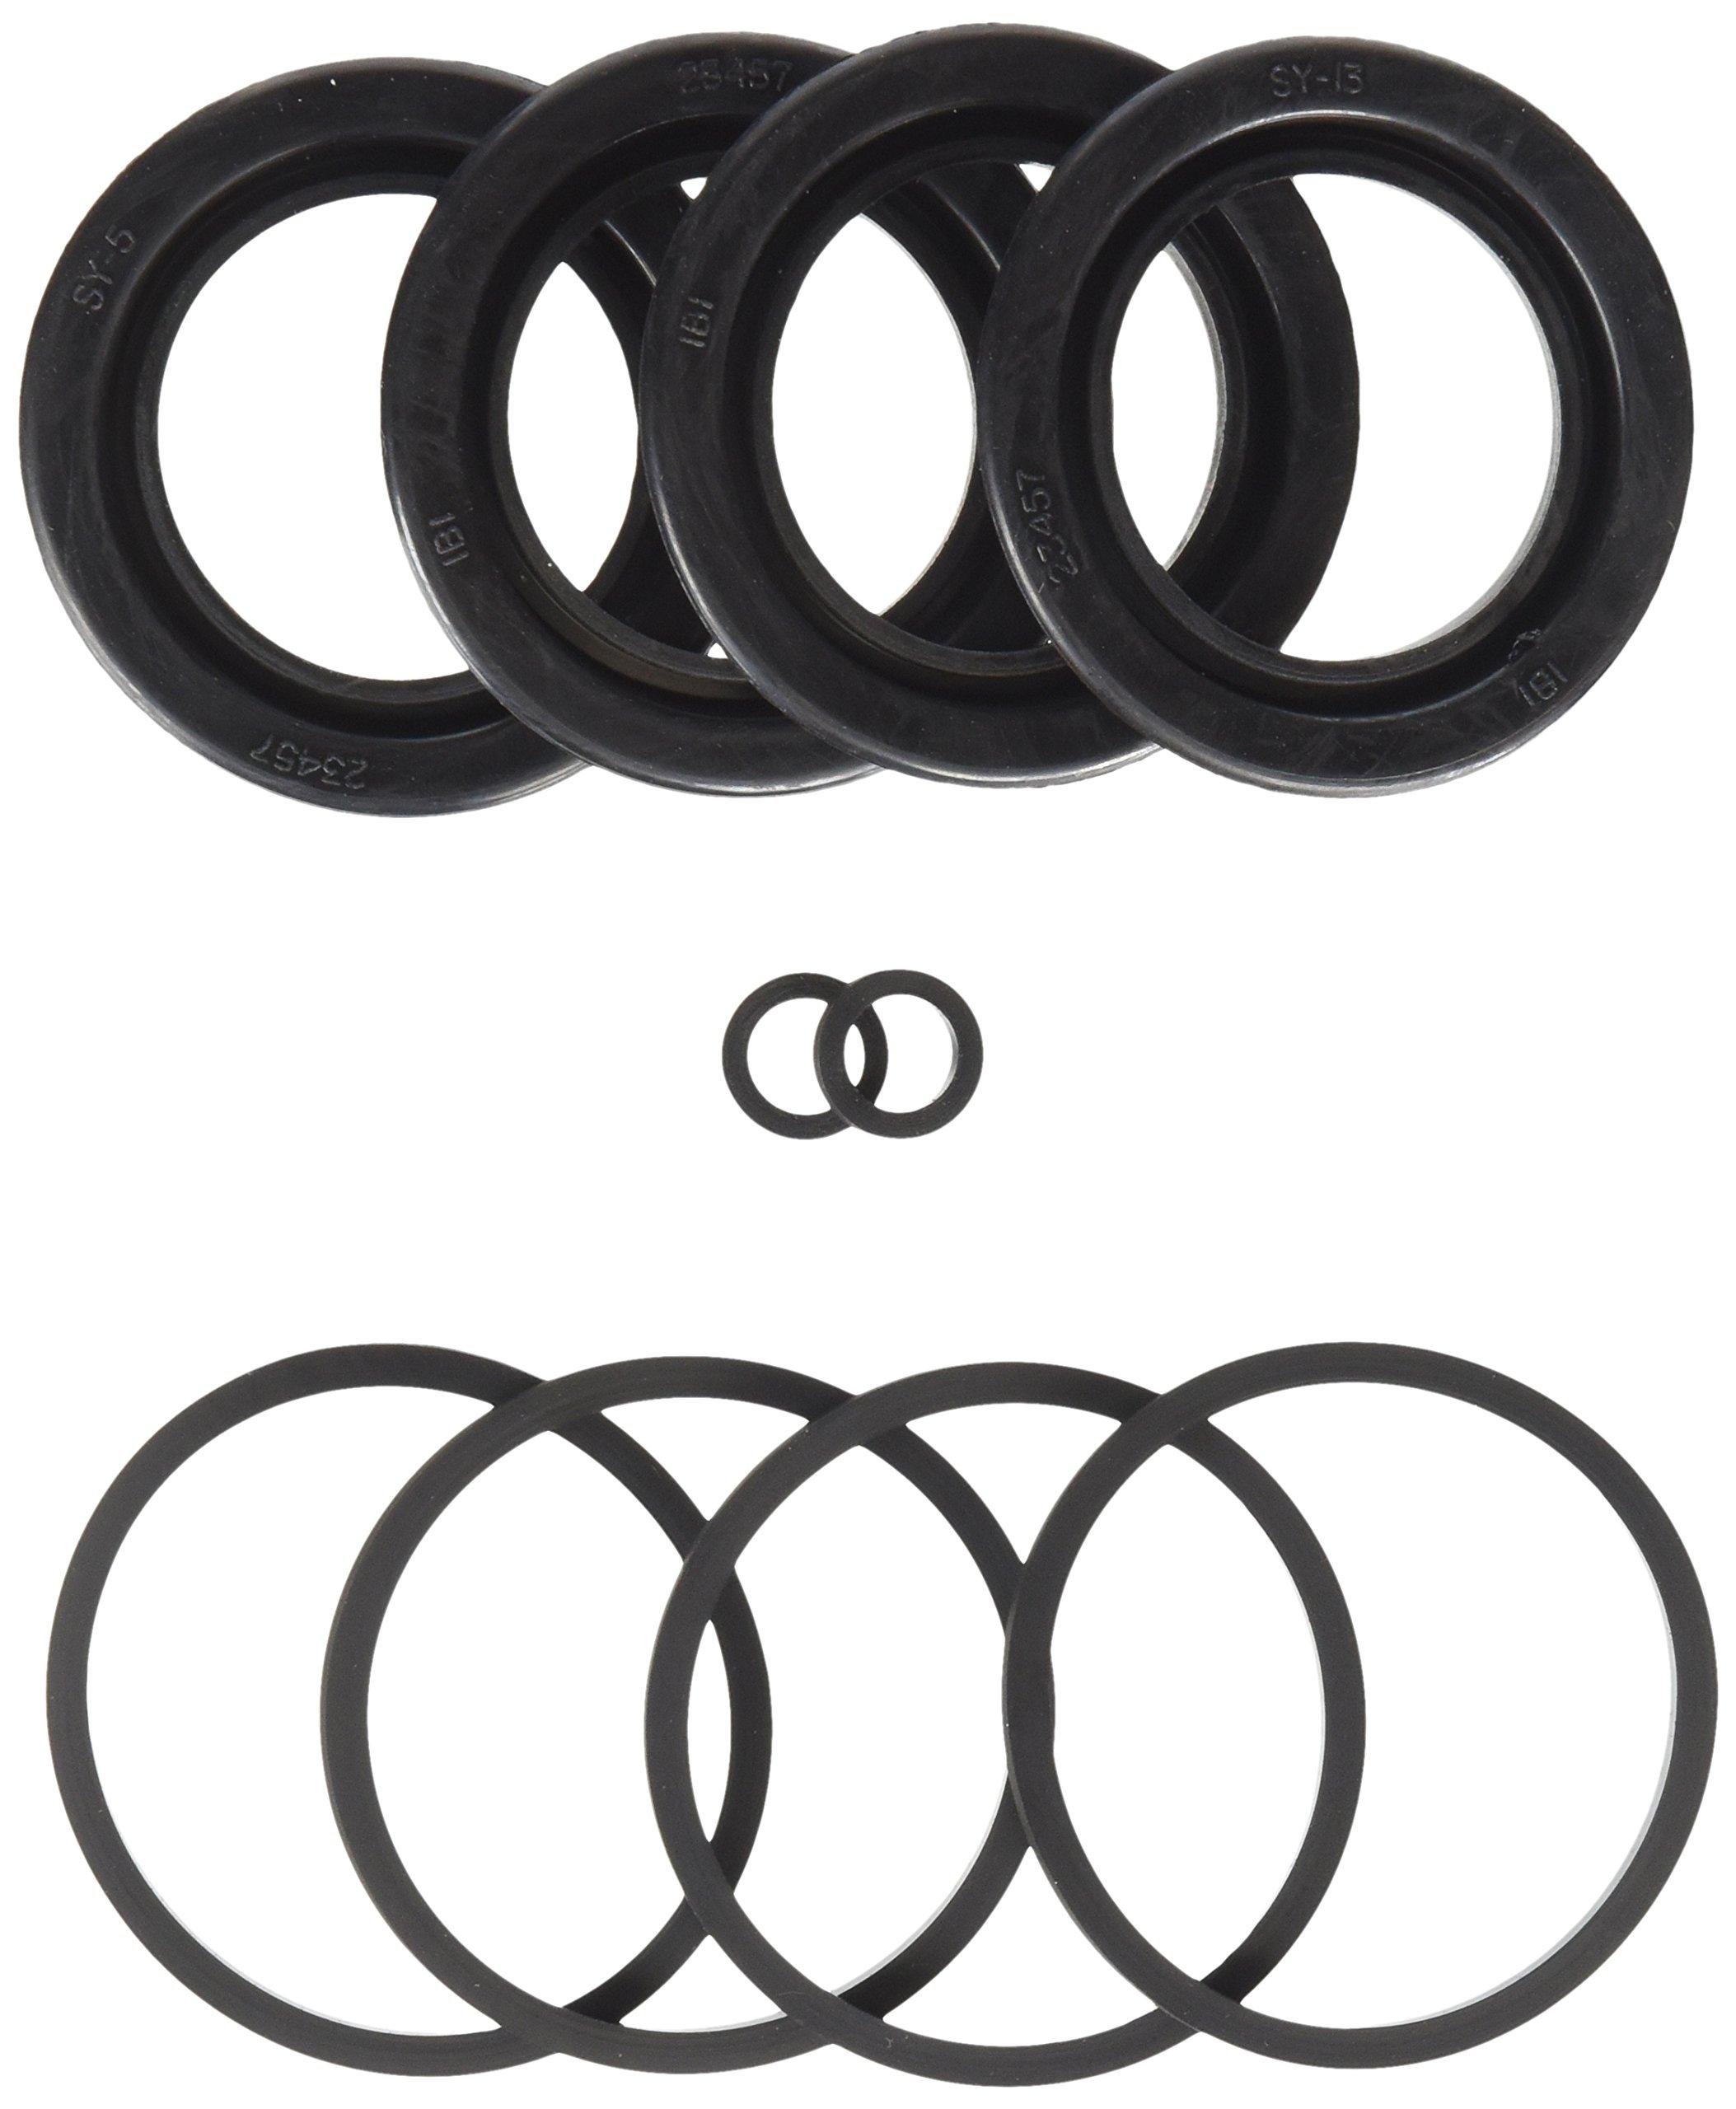 Centric Parts 143.44069 Caliper Kit